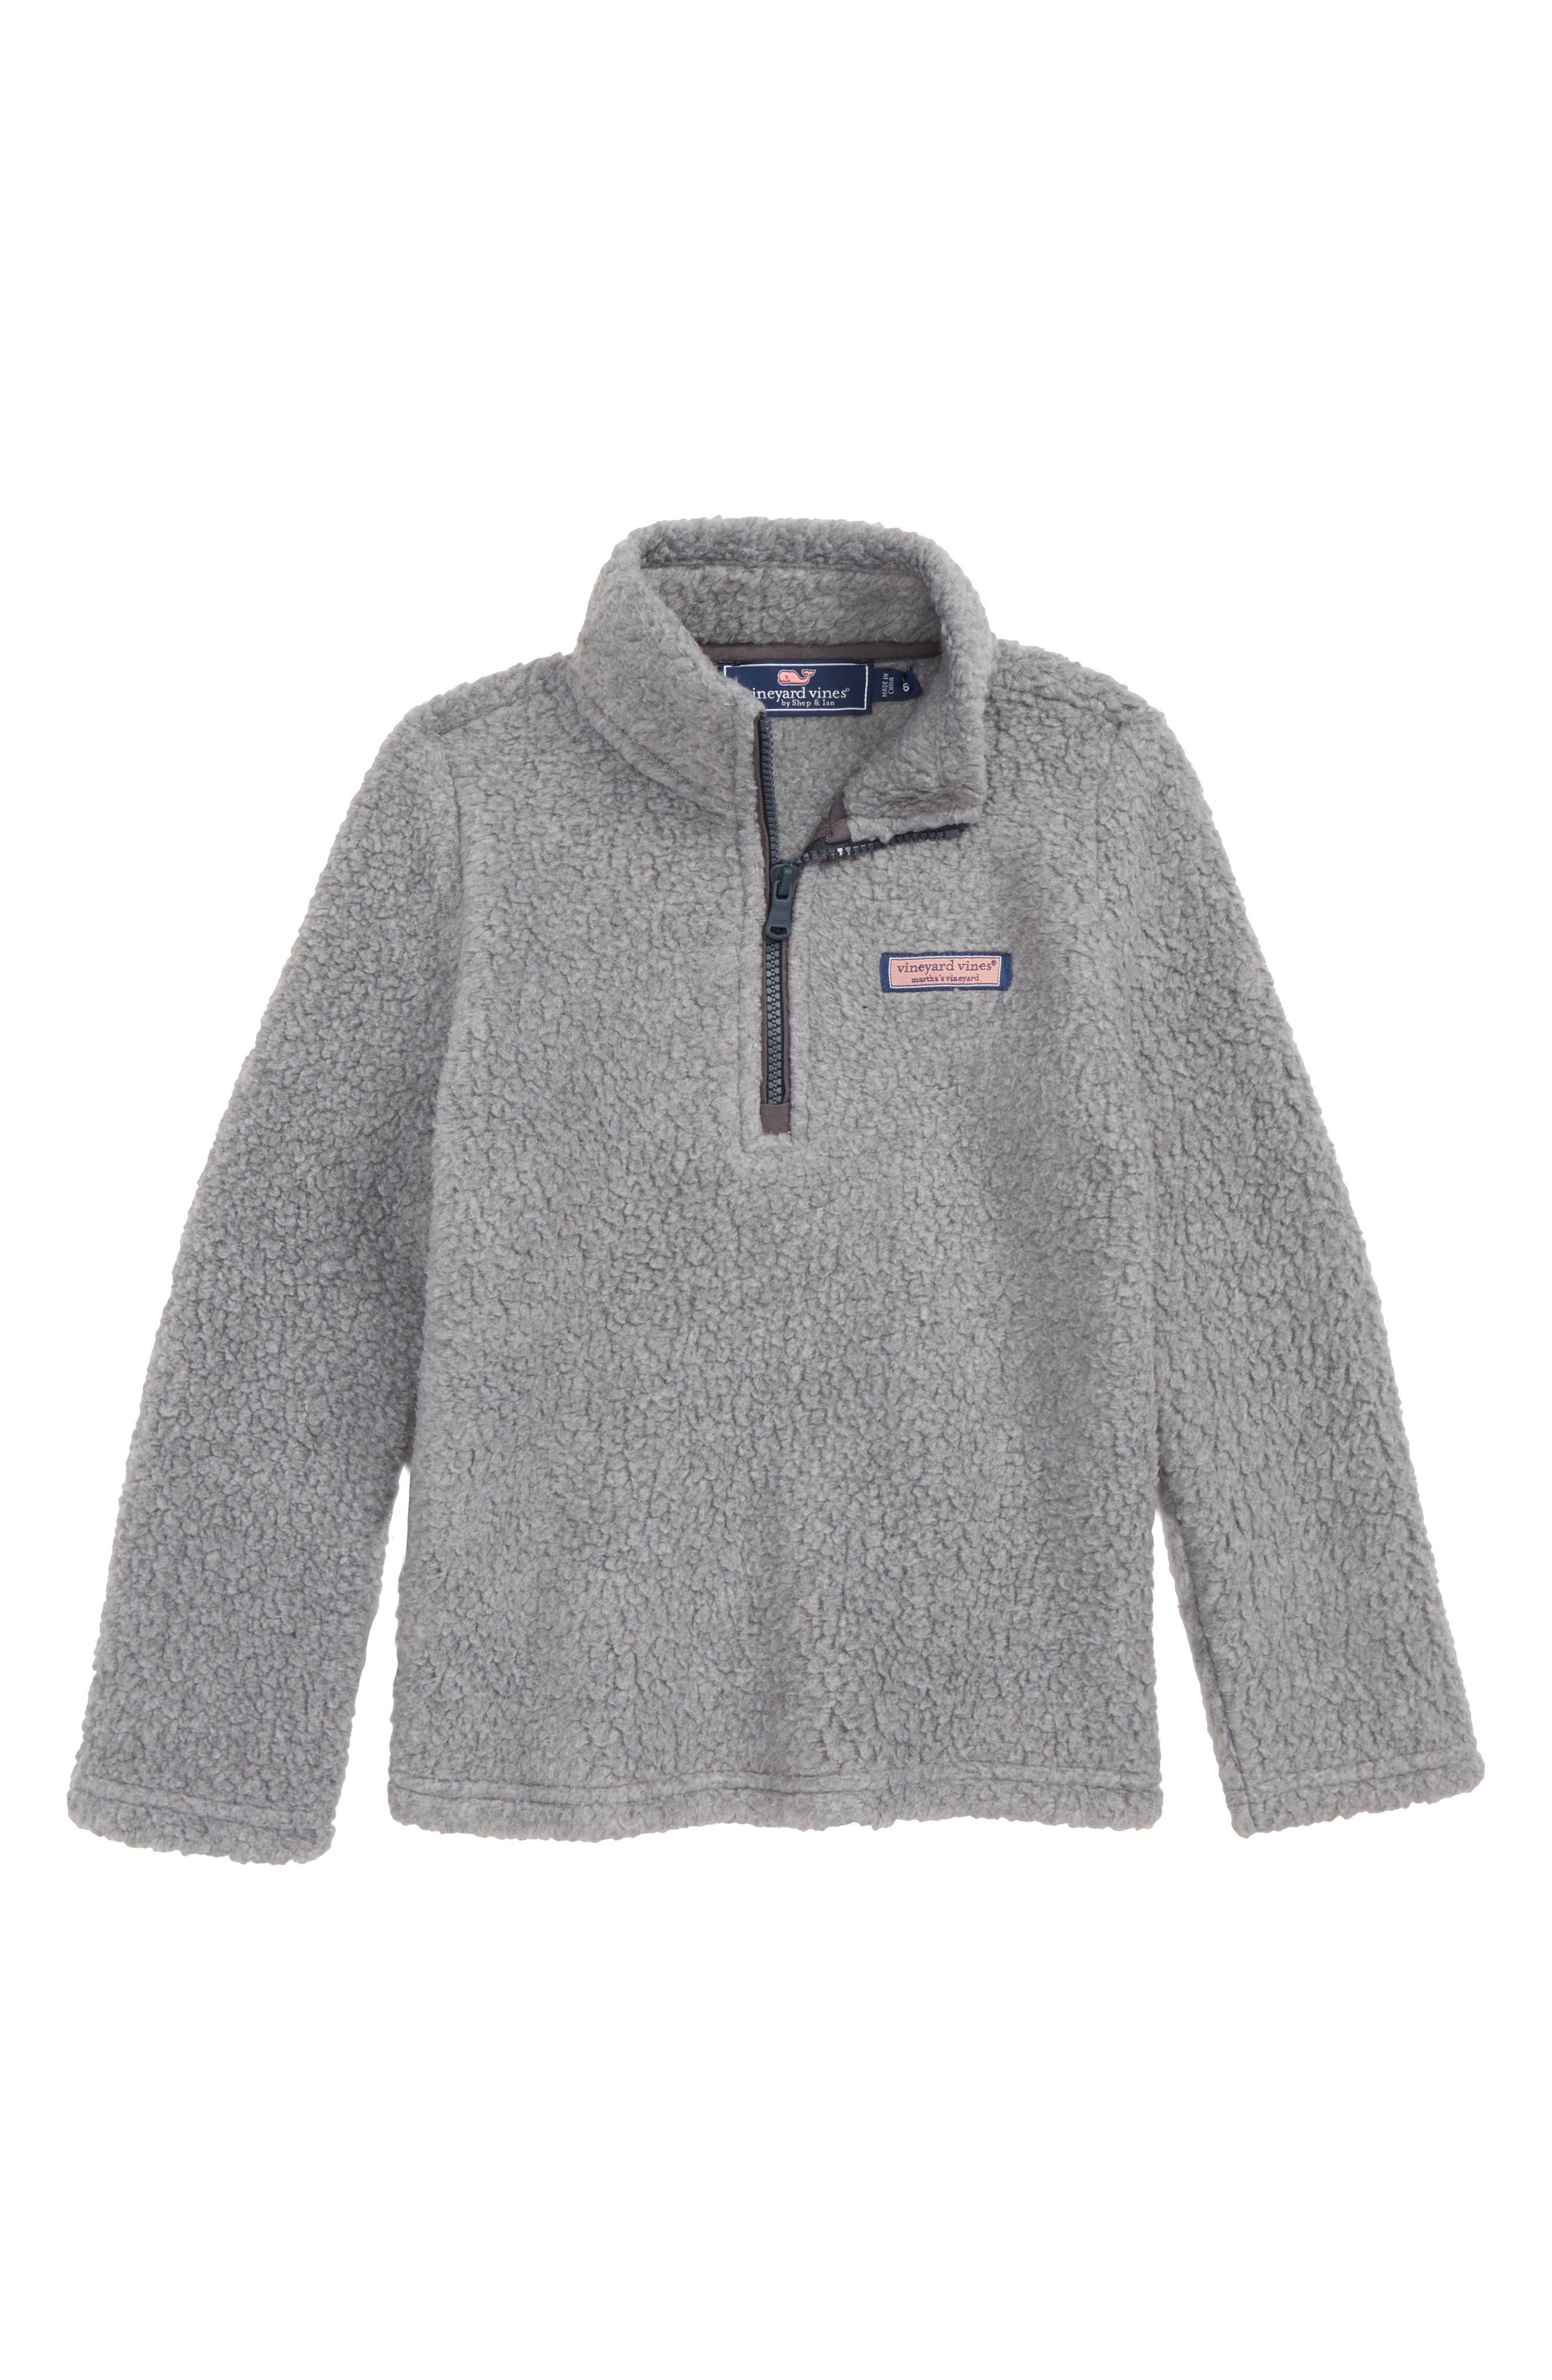 Harbor Fleece Half Zip Pullover, Main, color, GRAY HEATHER